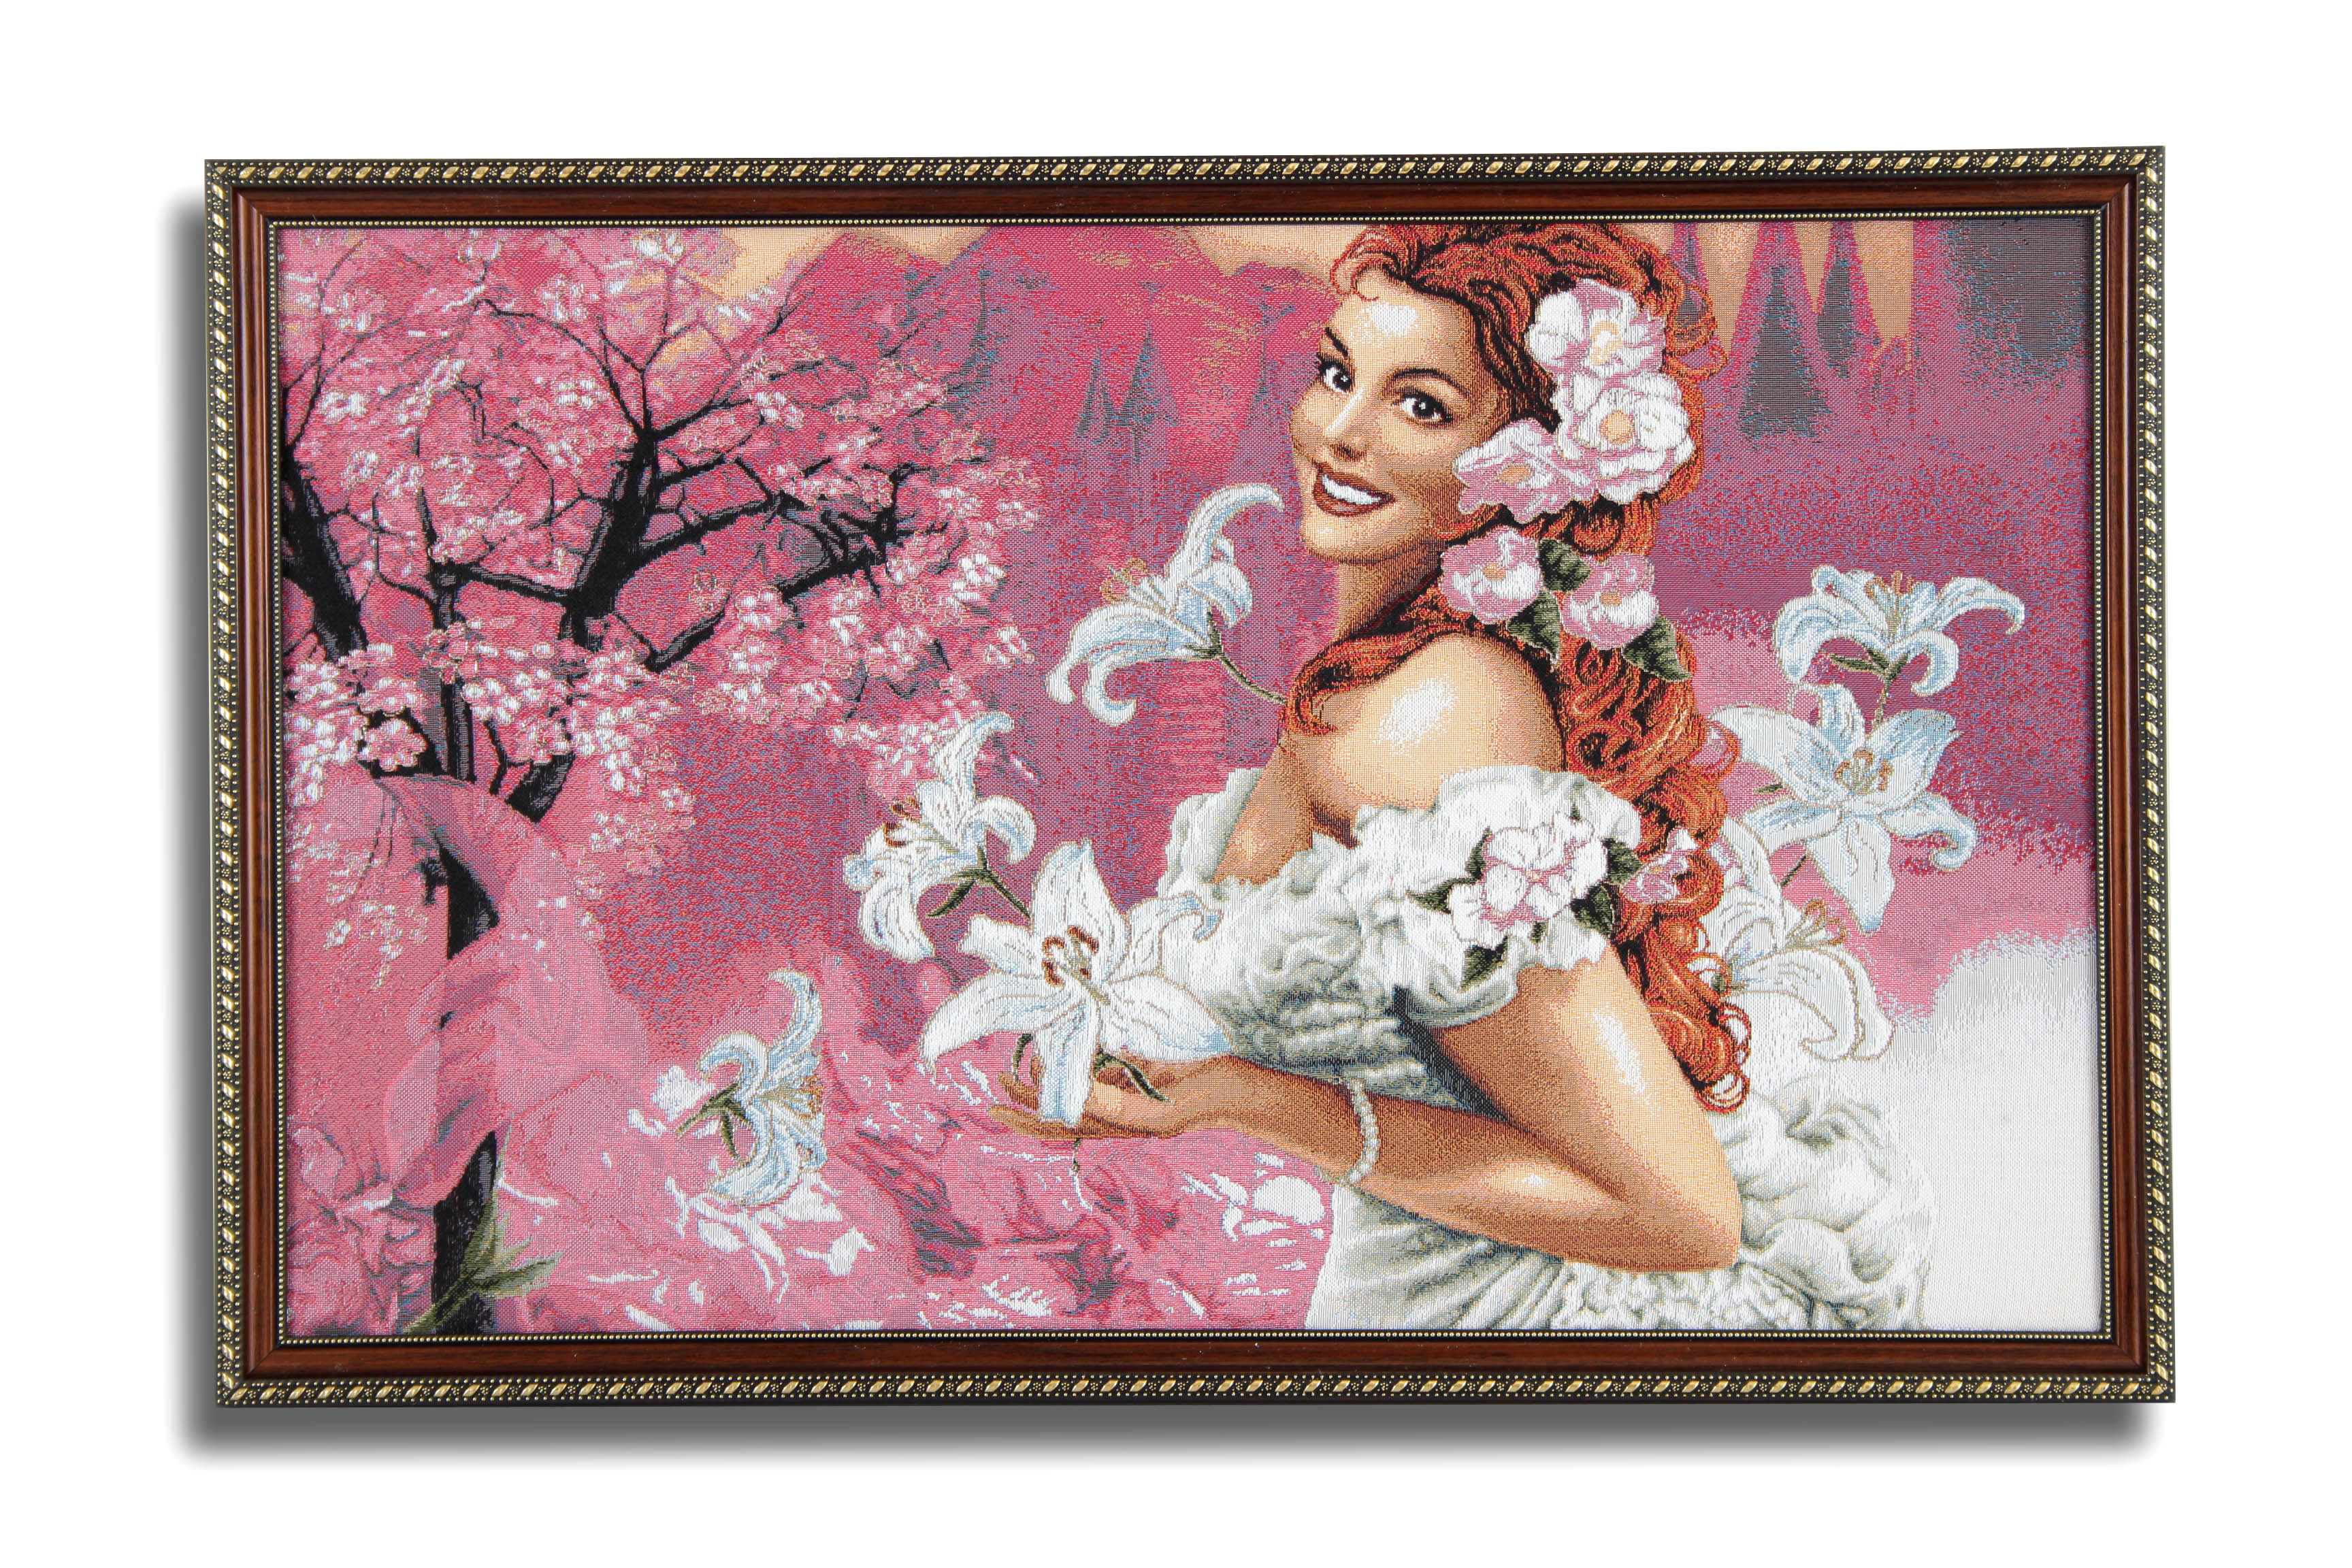 Картина Магазин гобеленов Девушка с лилиями 50*77 см, Гобелен